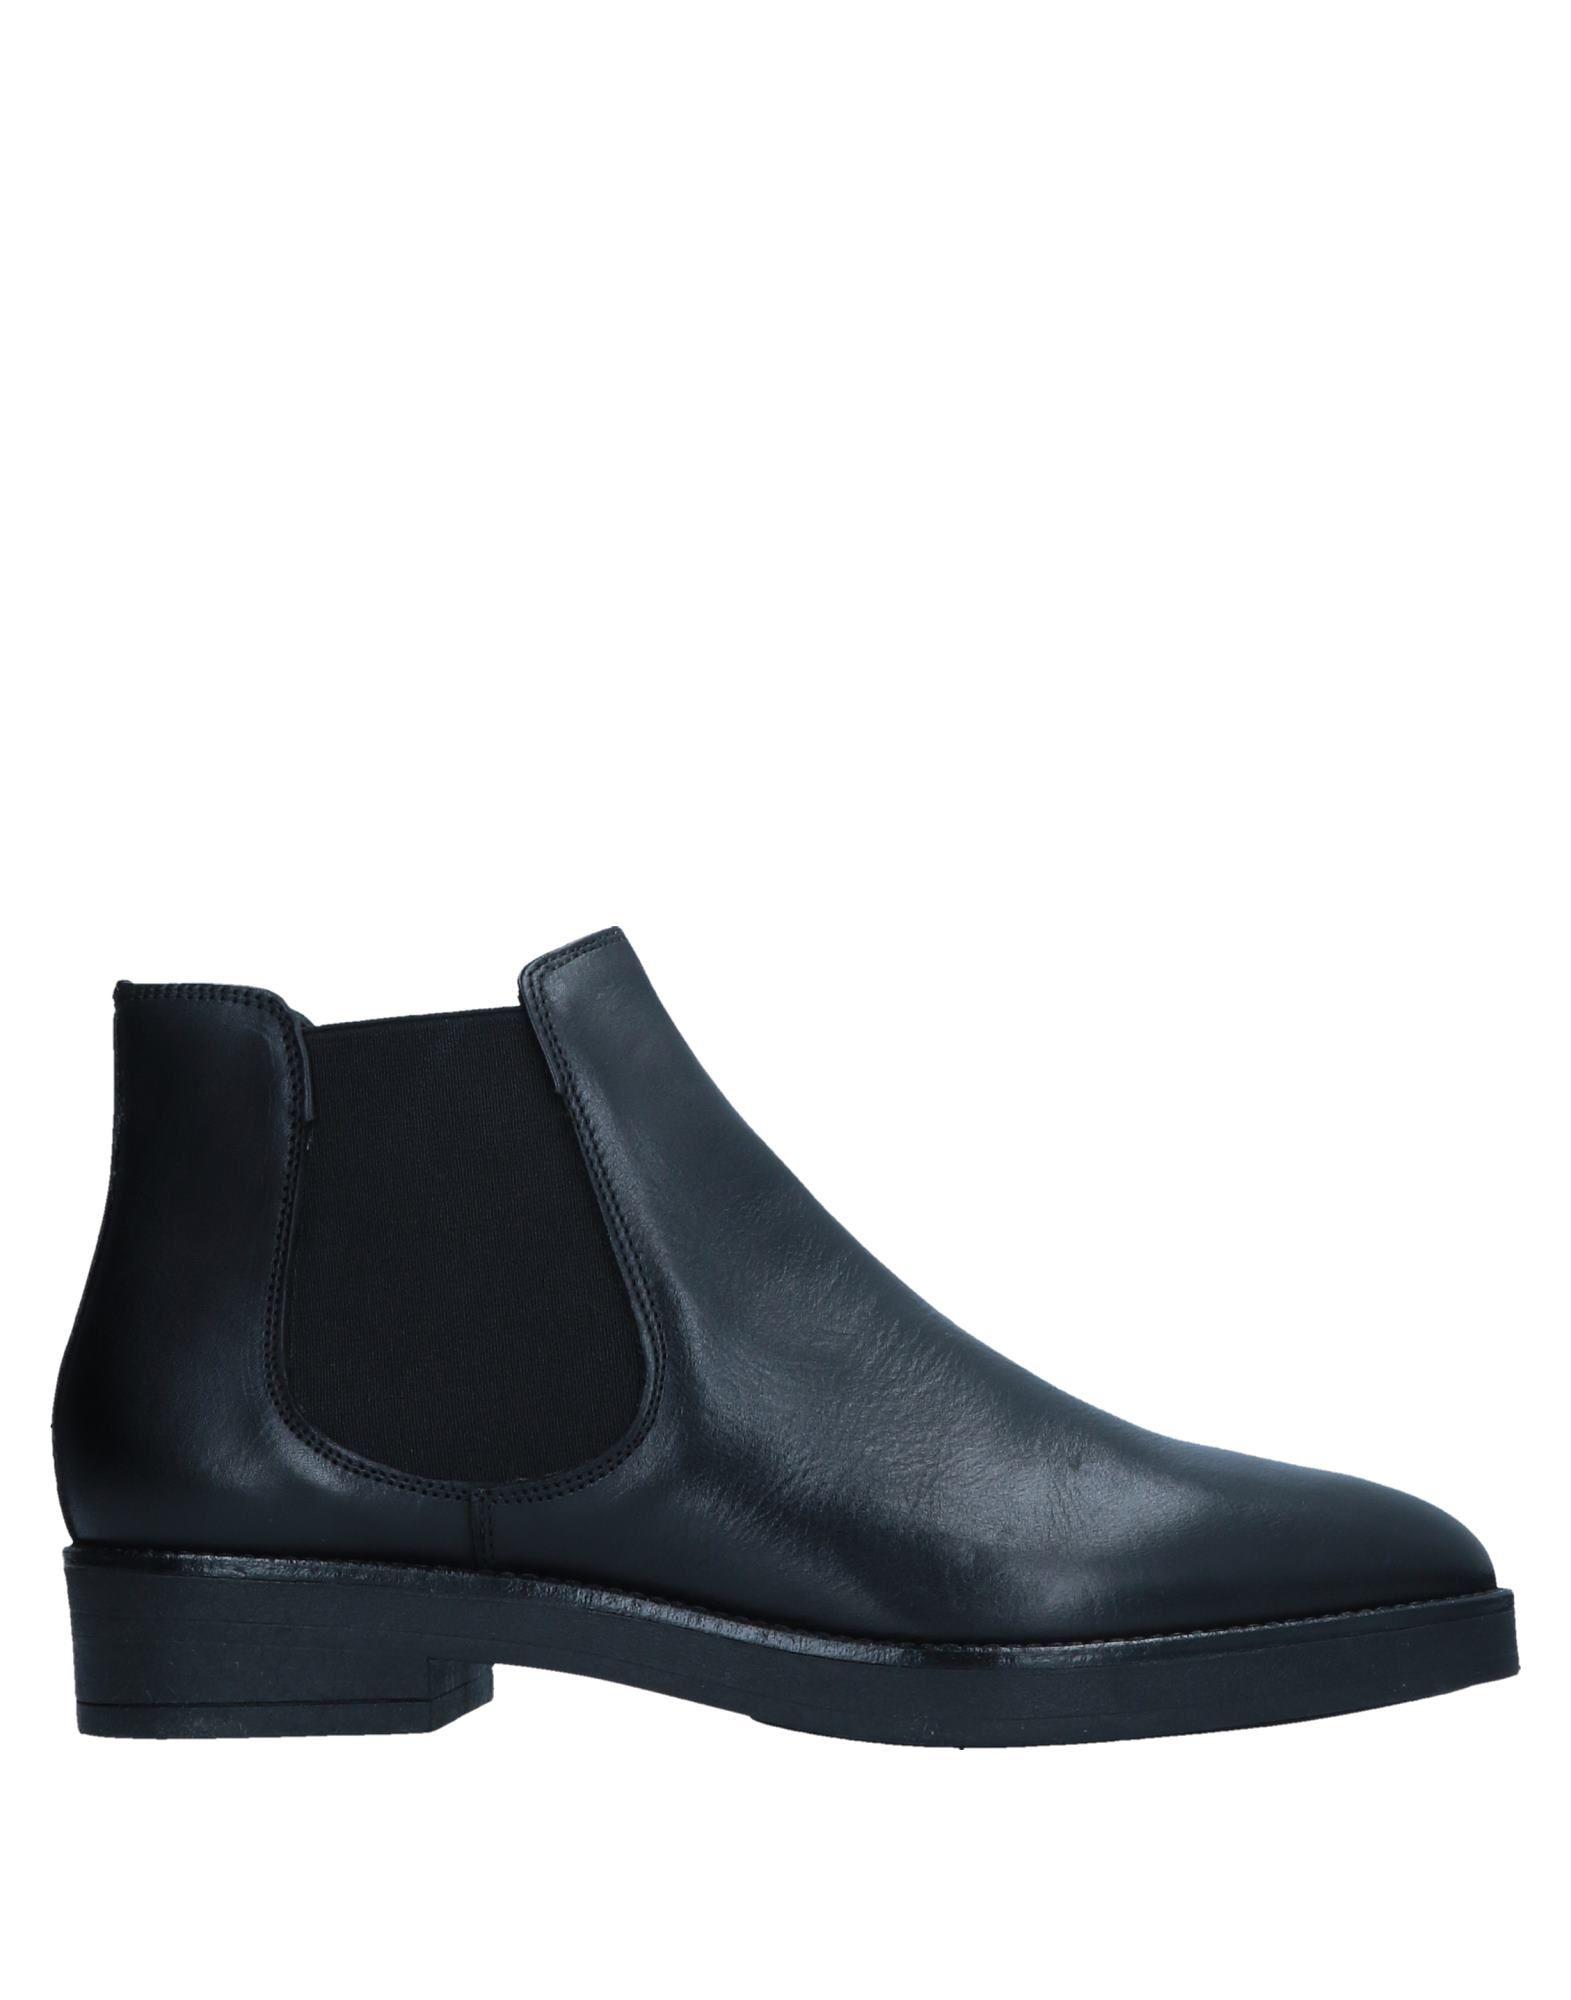 FRANCESCO MINICHINO | FRANCESCO MINICHINO Ankle boots 11522132 | Goxip